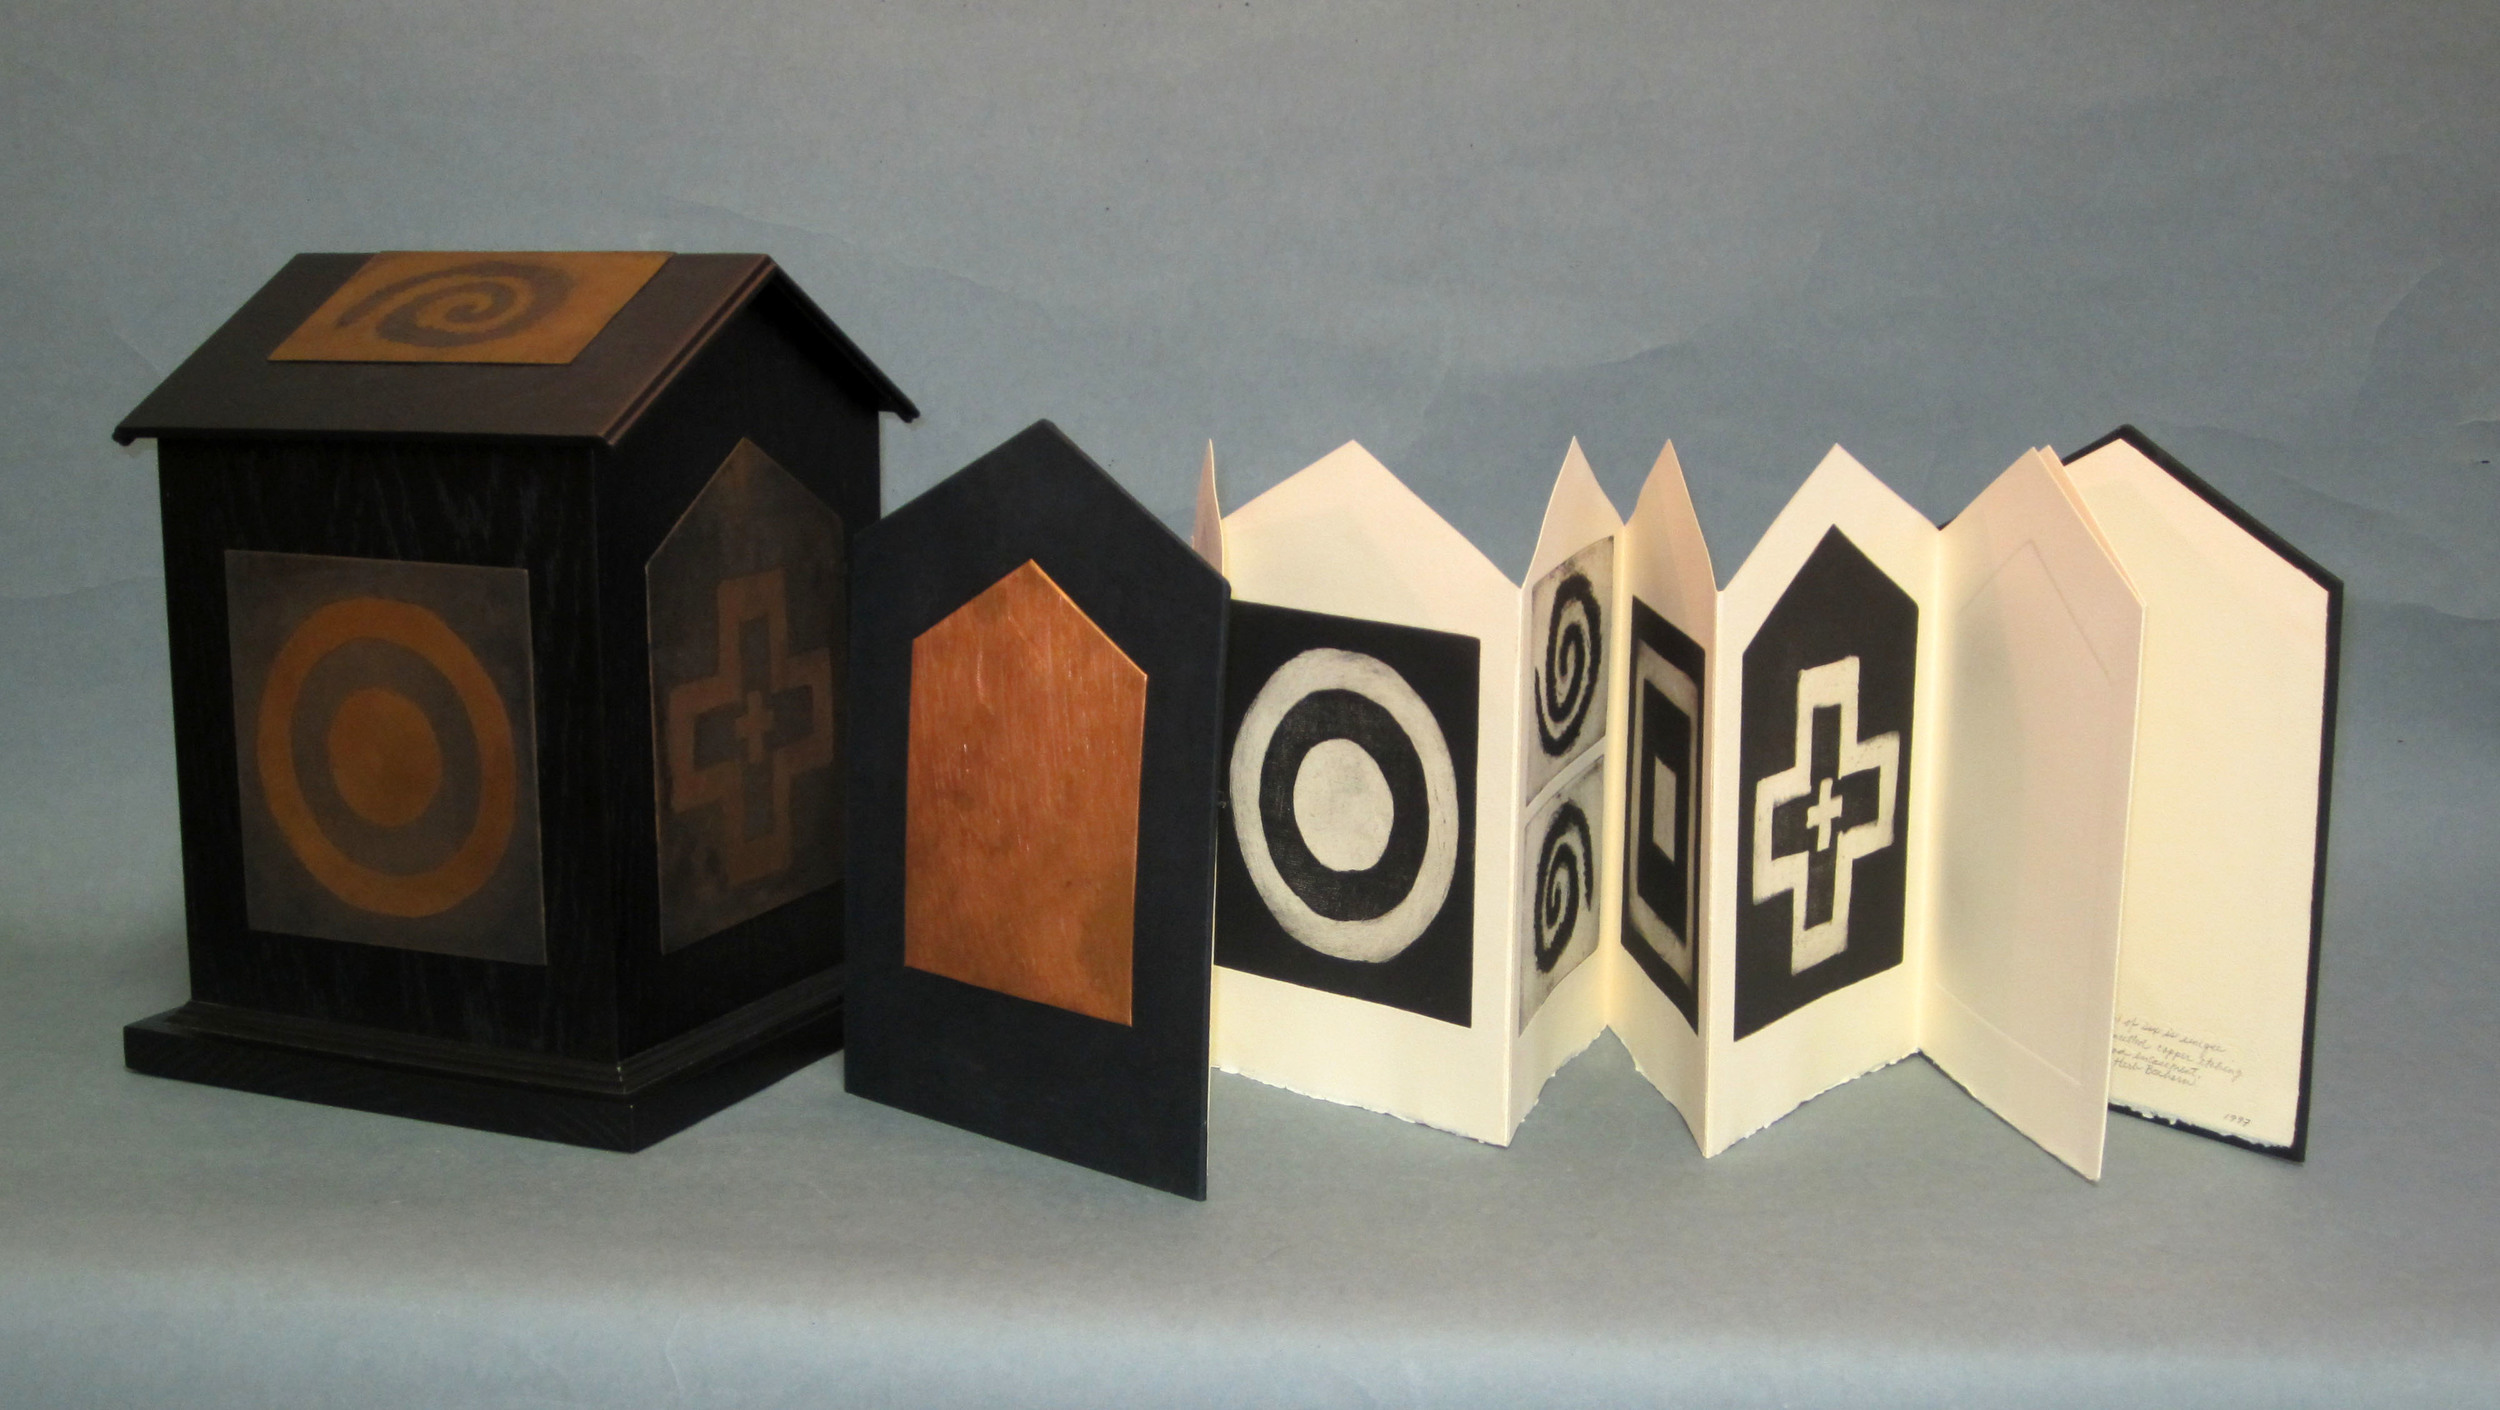 House of Symbols